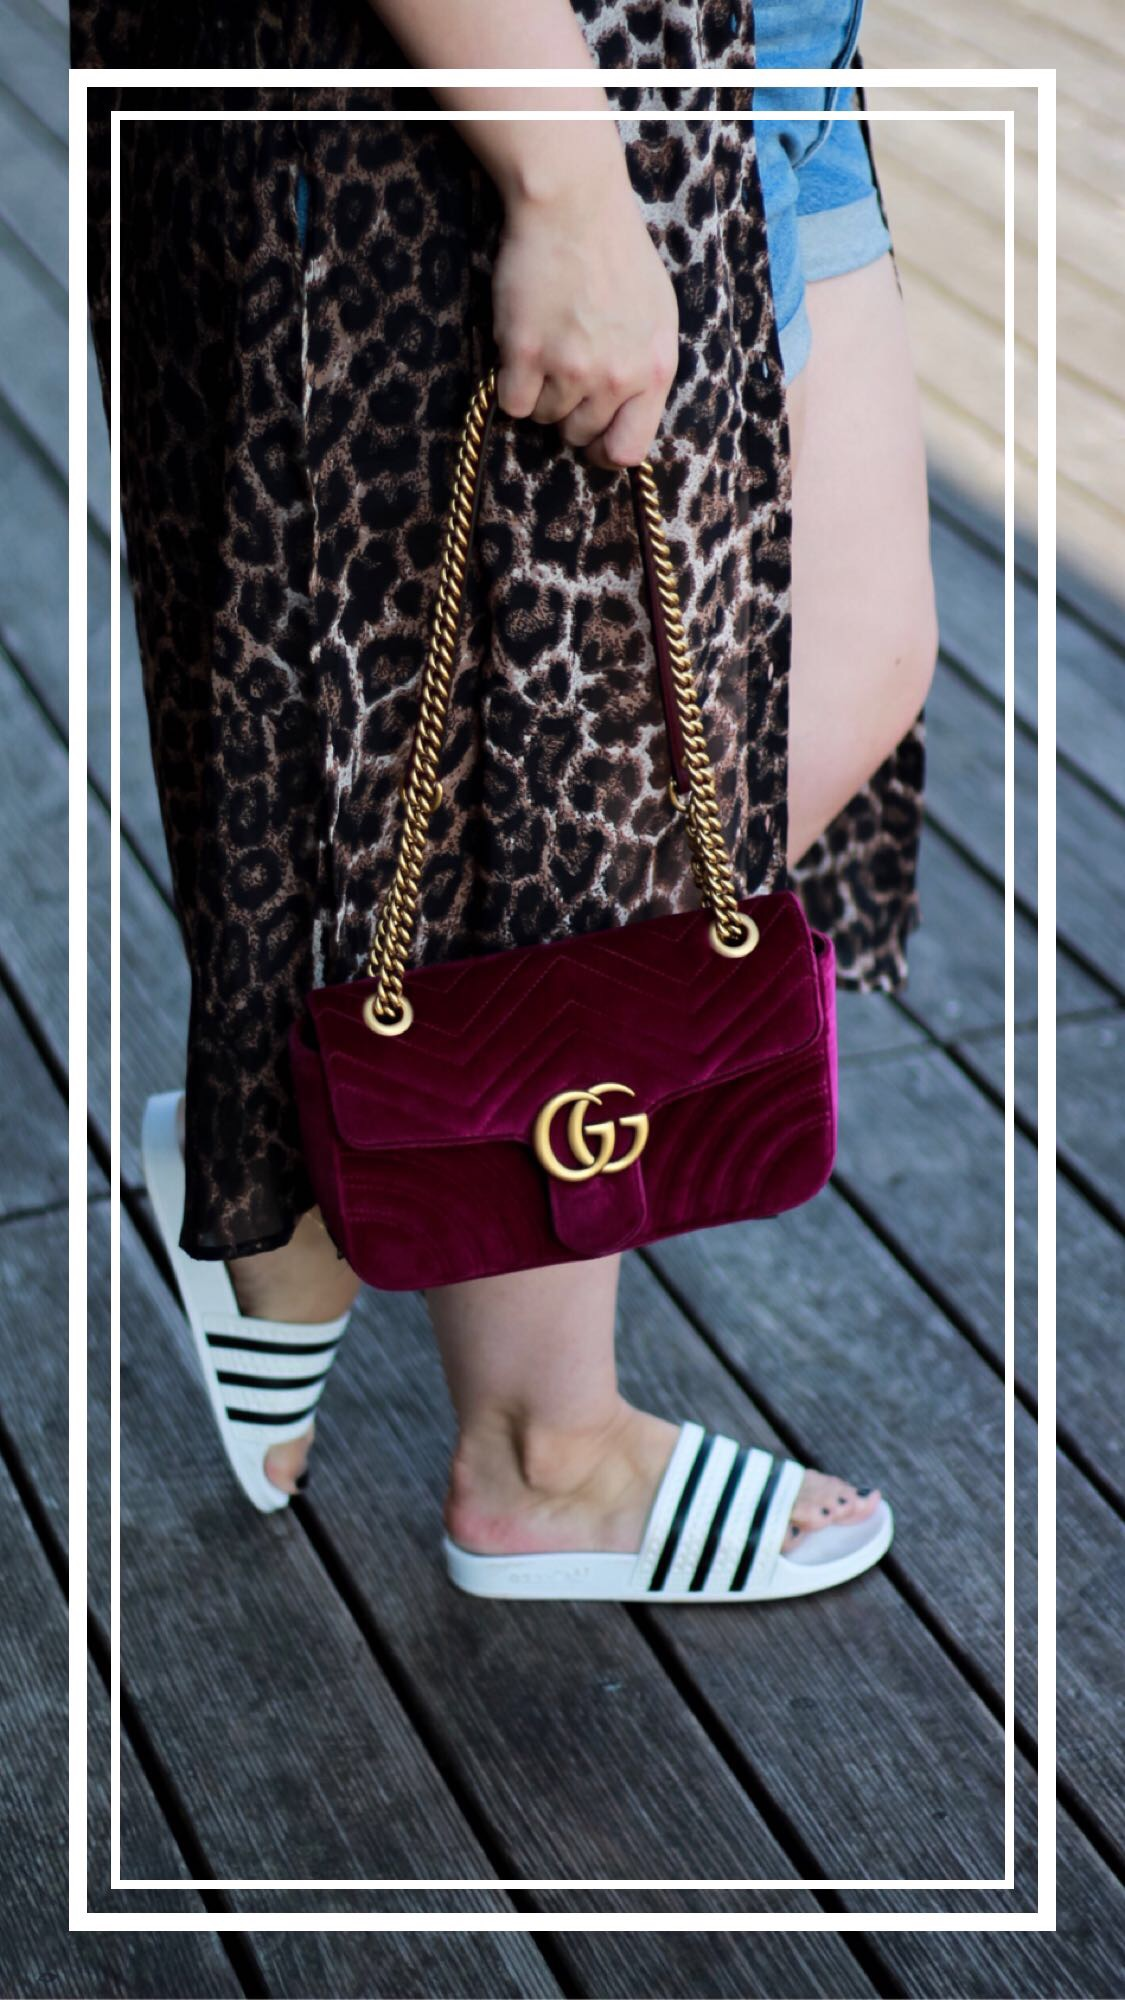 Miss-Suzie-Loves-Leopard-Print-Jeansshort-Gucci-Marmont-weisses-Top-Susanne-Heidebach-Curvyblogger